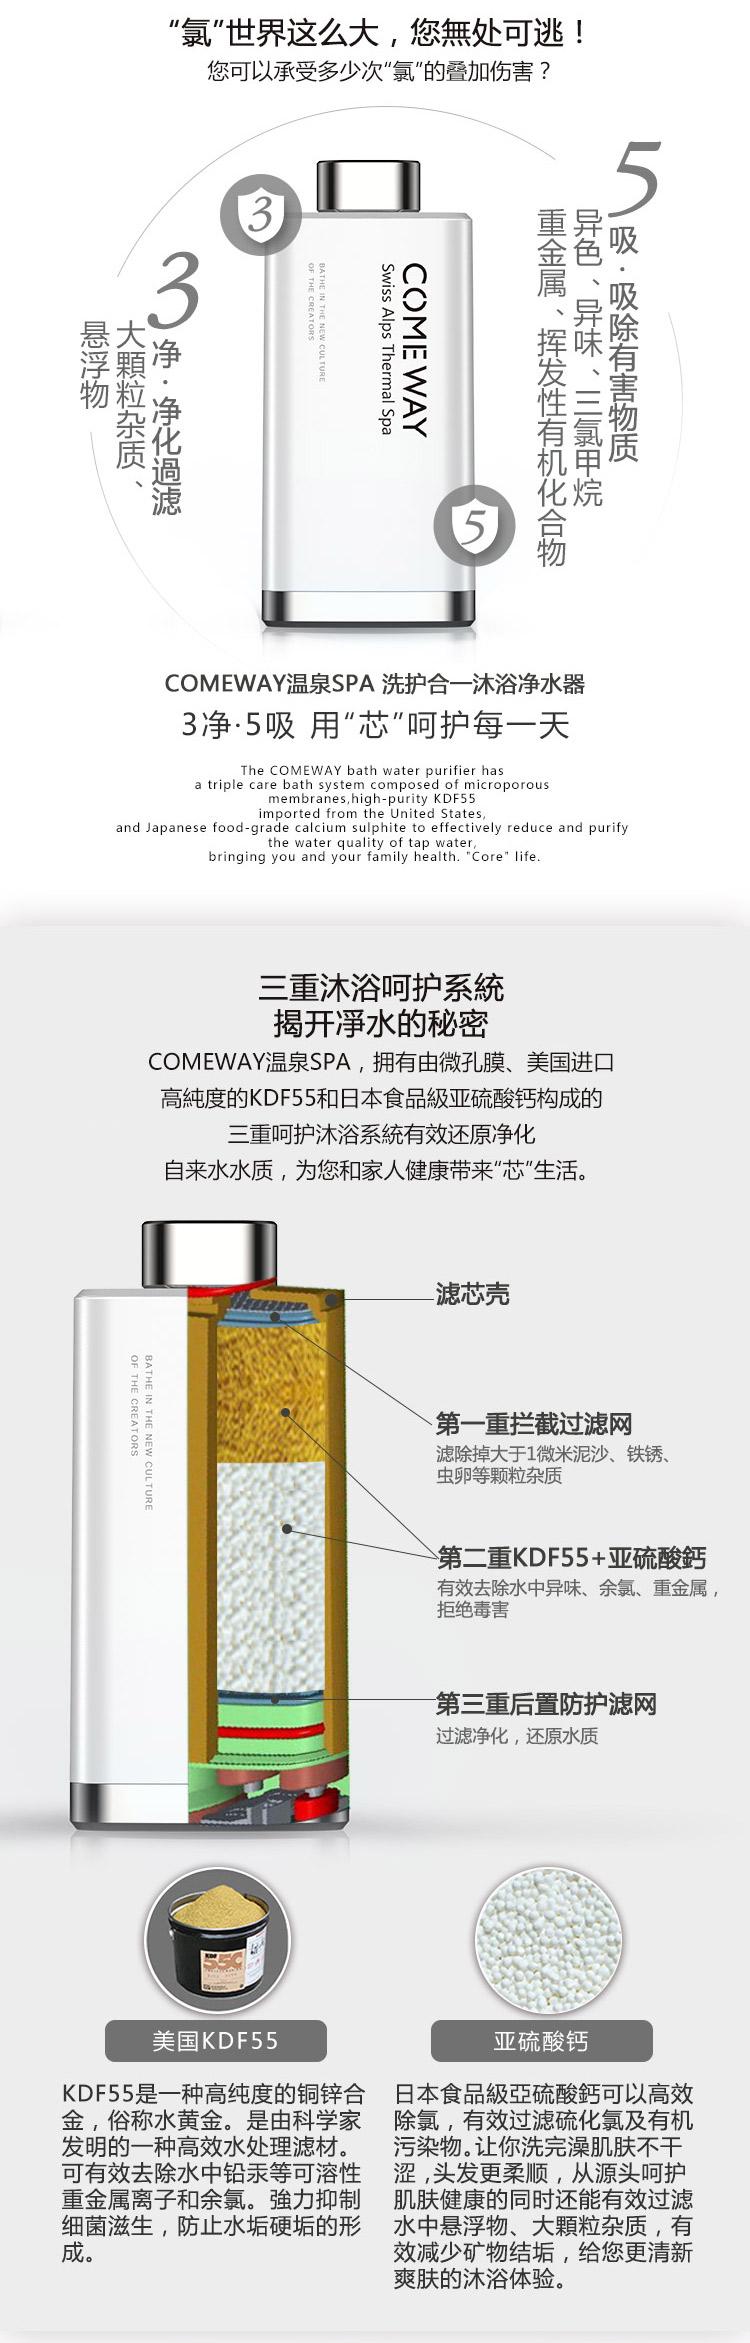 comeway-spa-1-简体_06.jpg